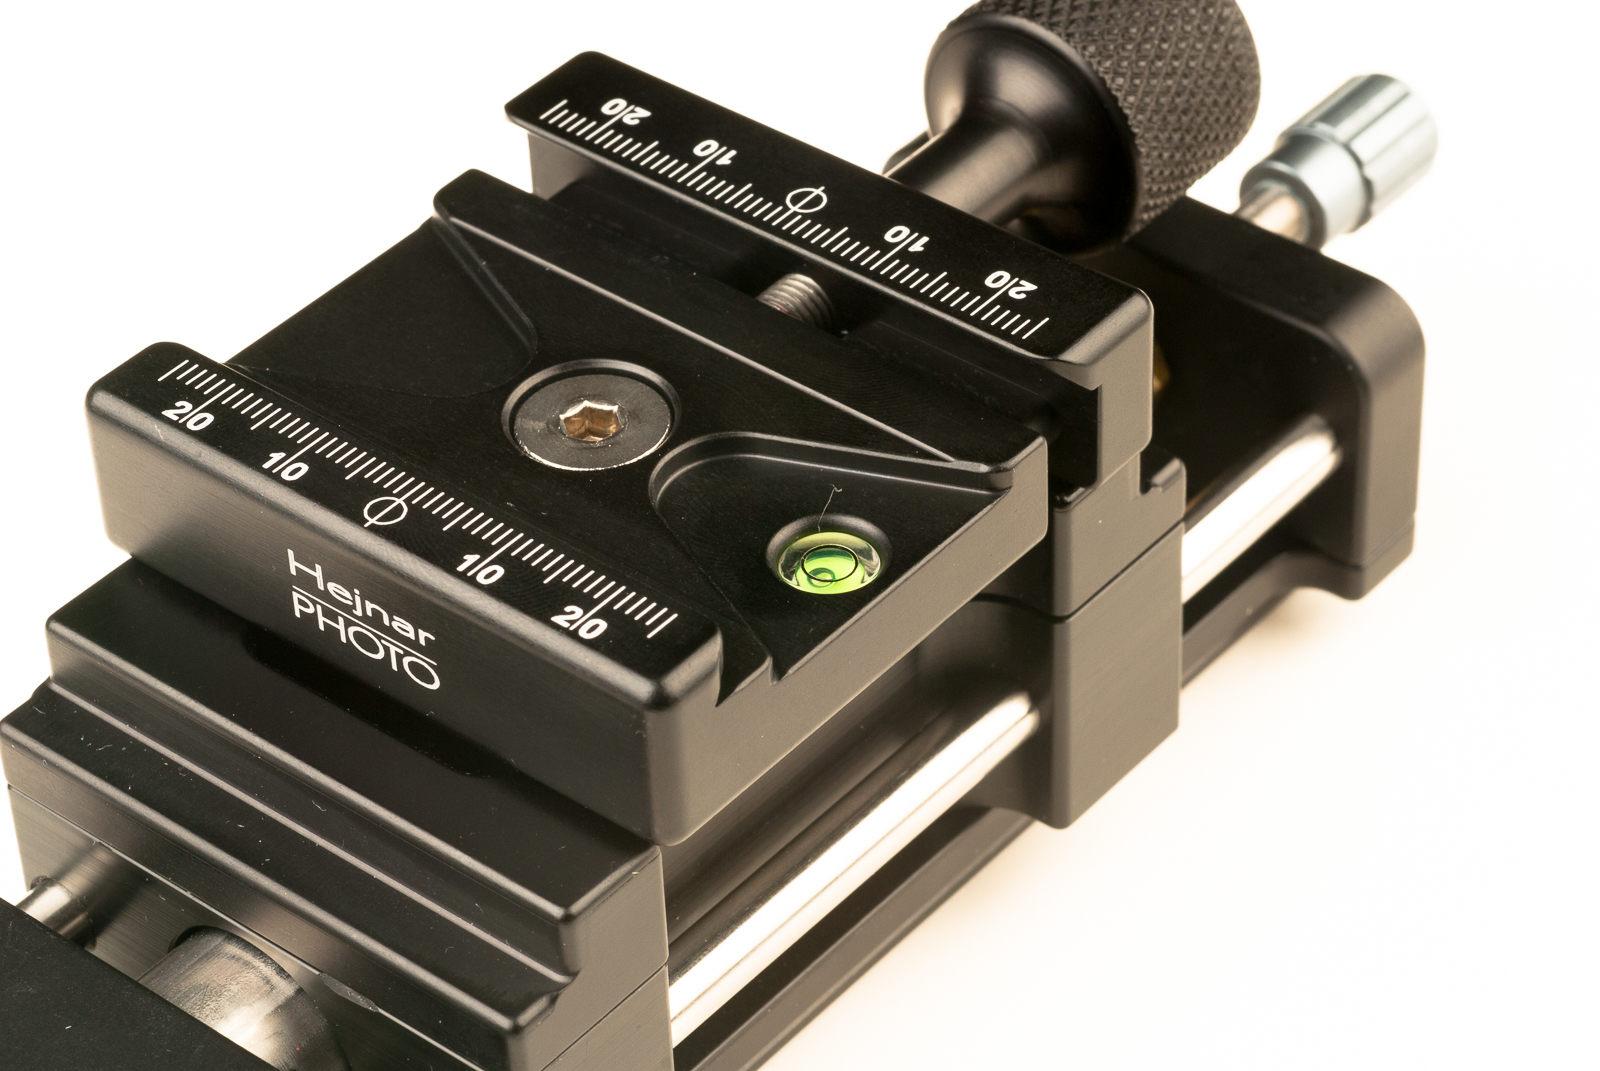 Hejnar PHOTO MS4-100-1 Macro Rail - F72b QR clamp closeup